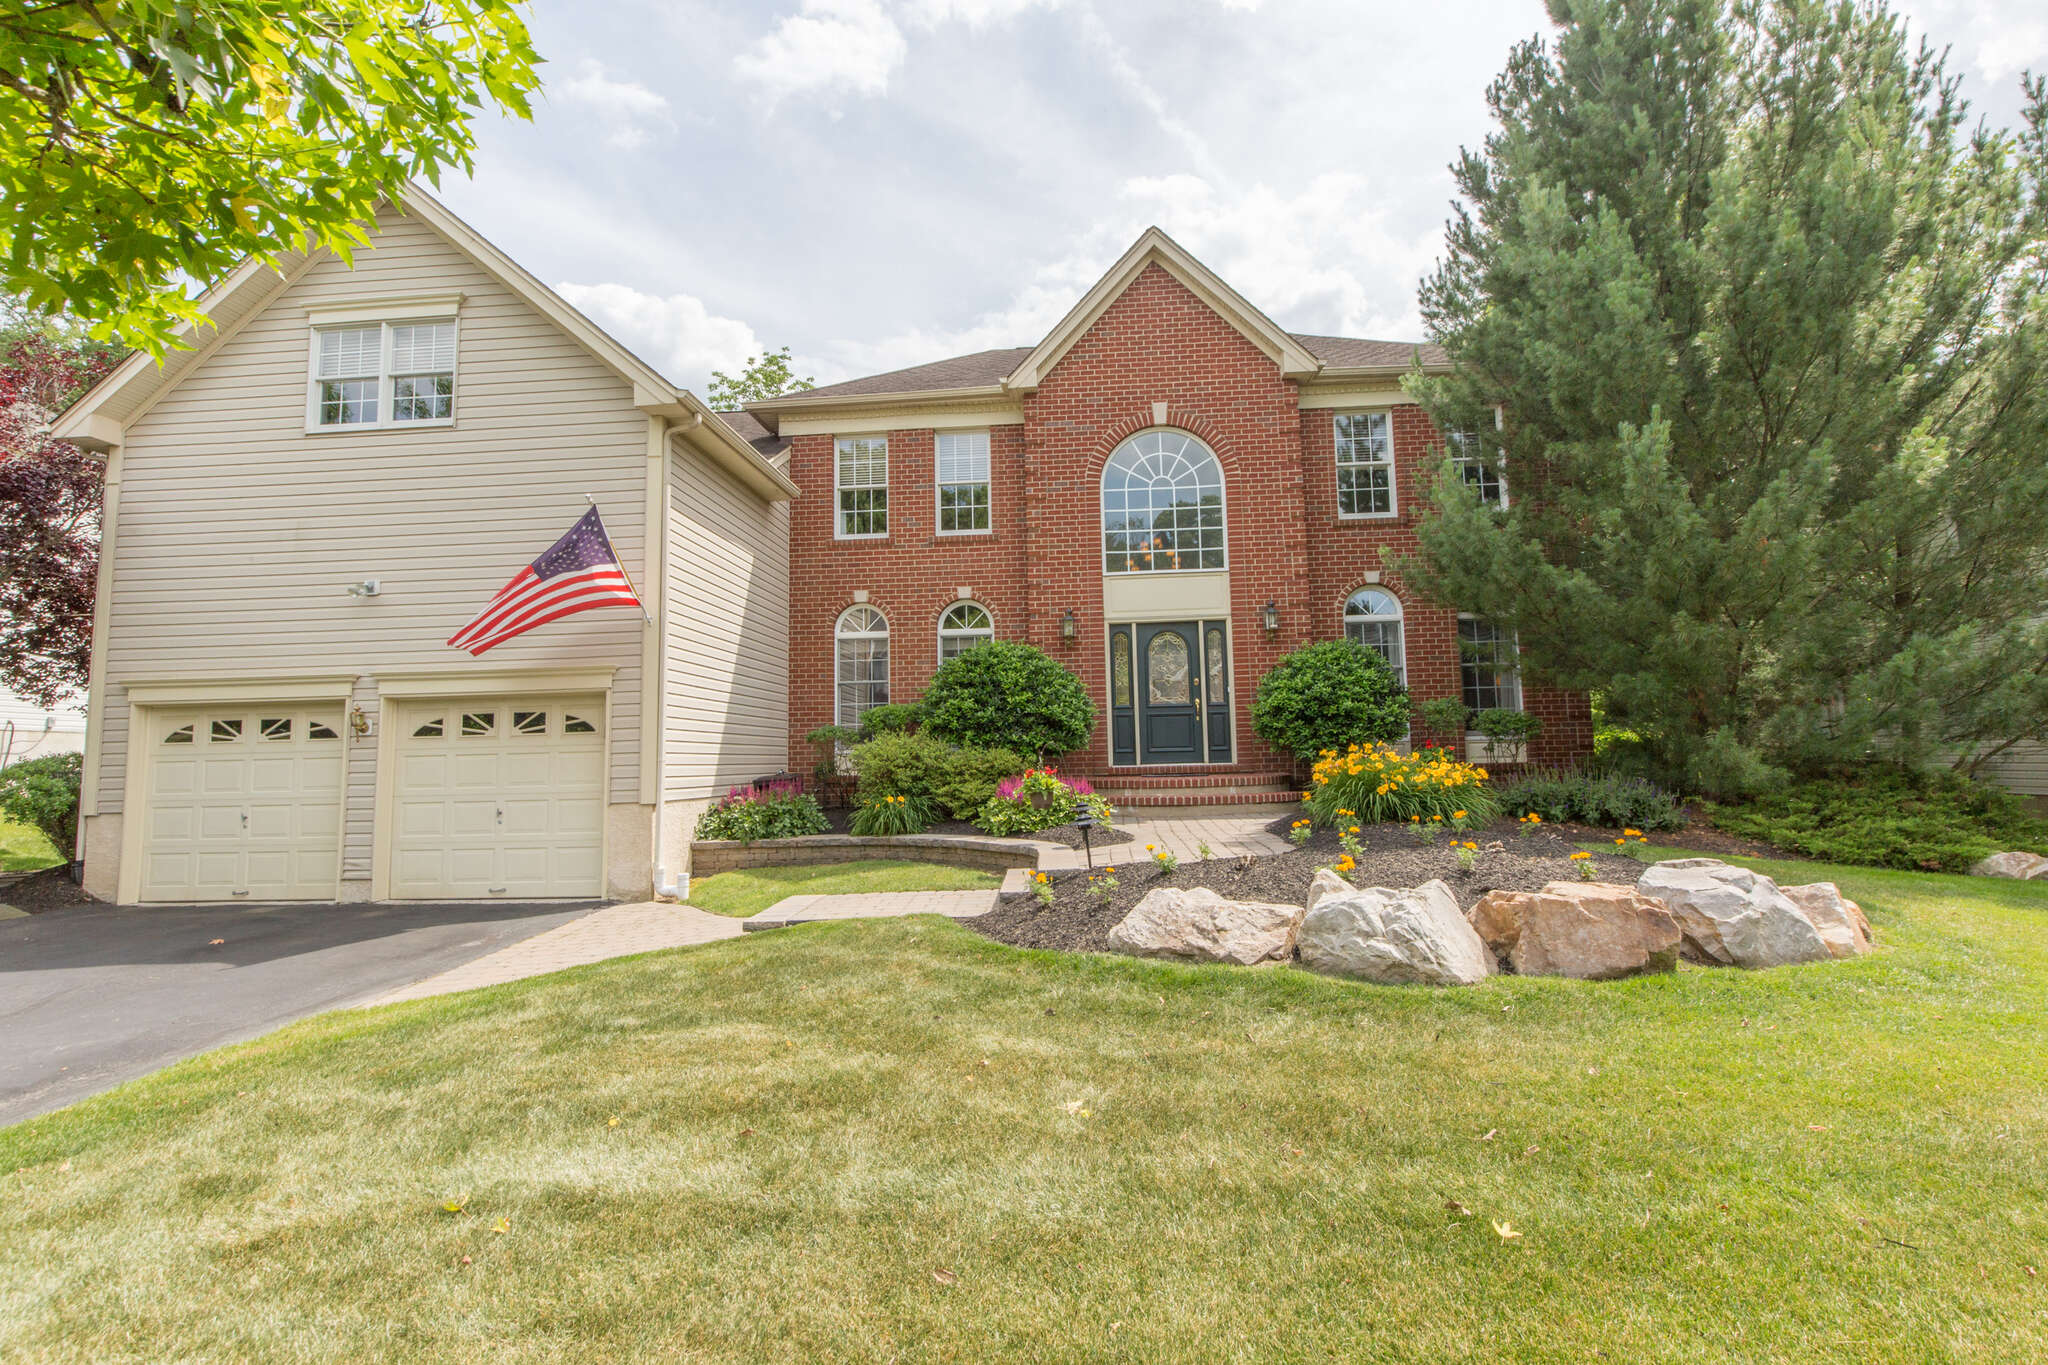 Single Family for Sale at 3637 Green Ridge Rd Furlong, Pennsylvania 18925 United States